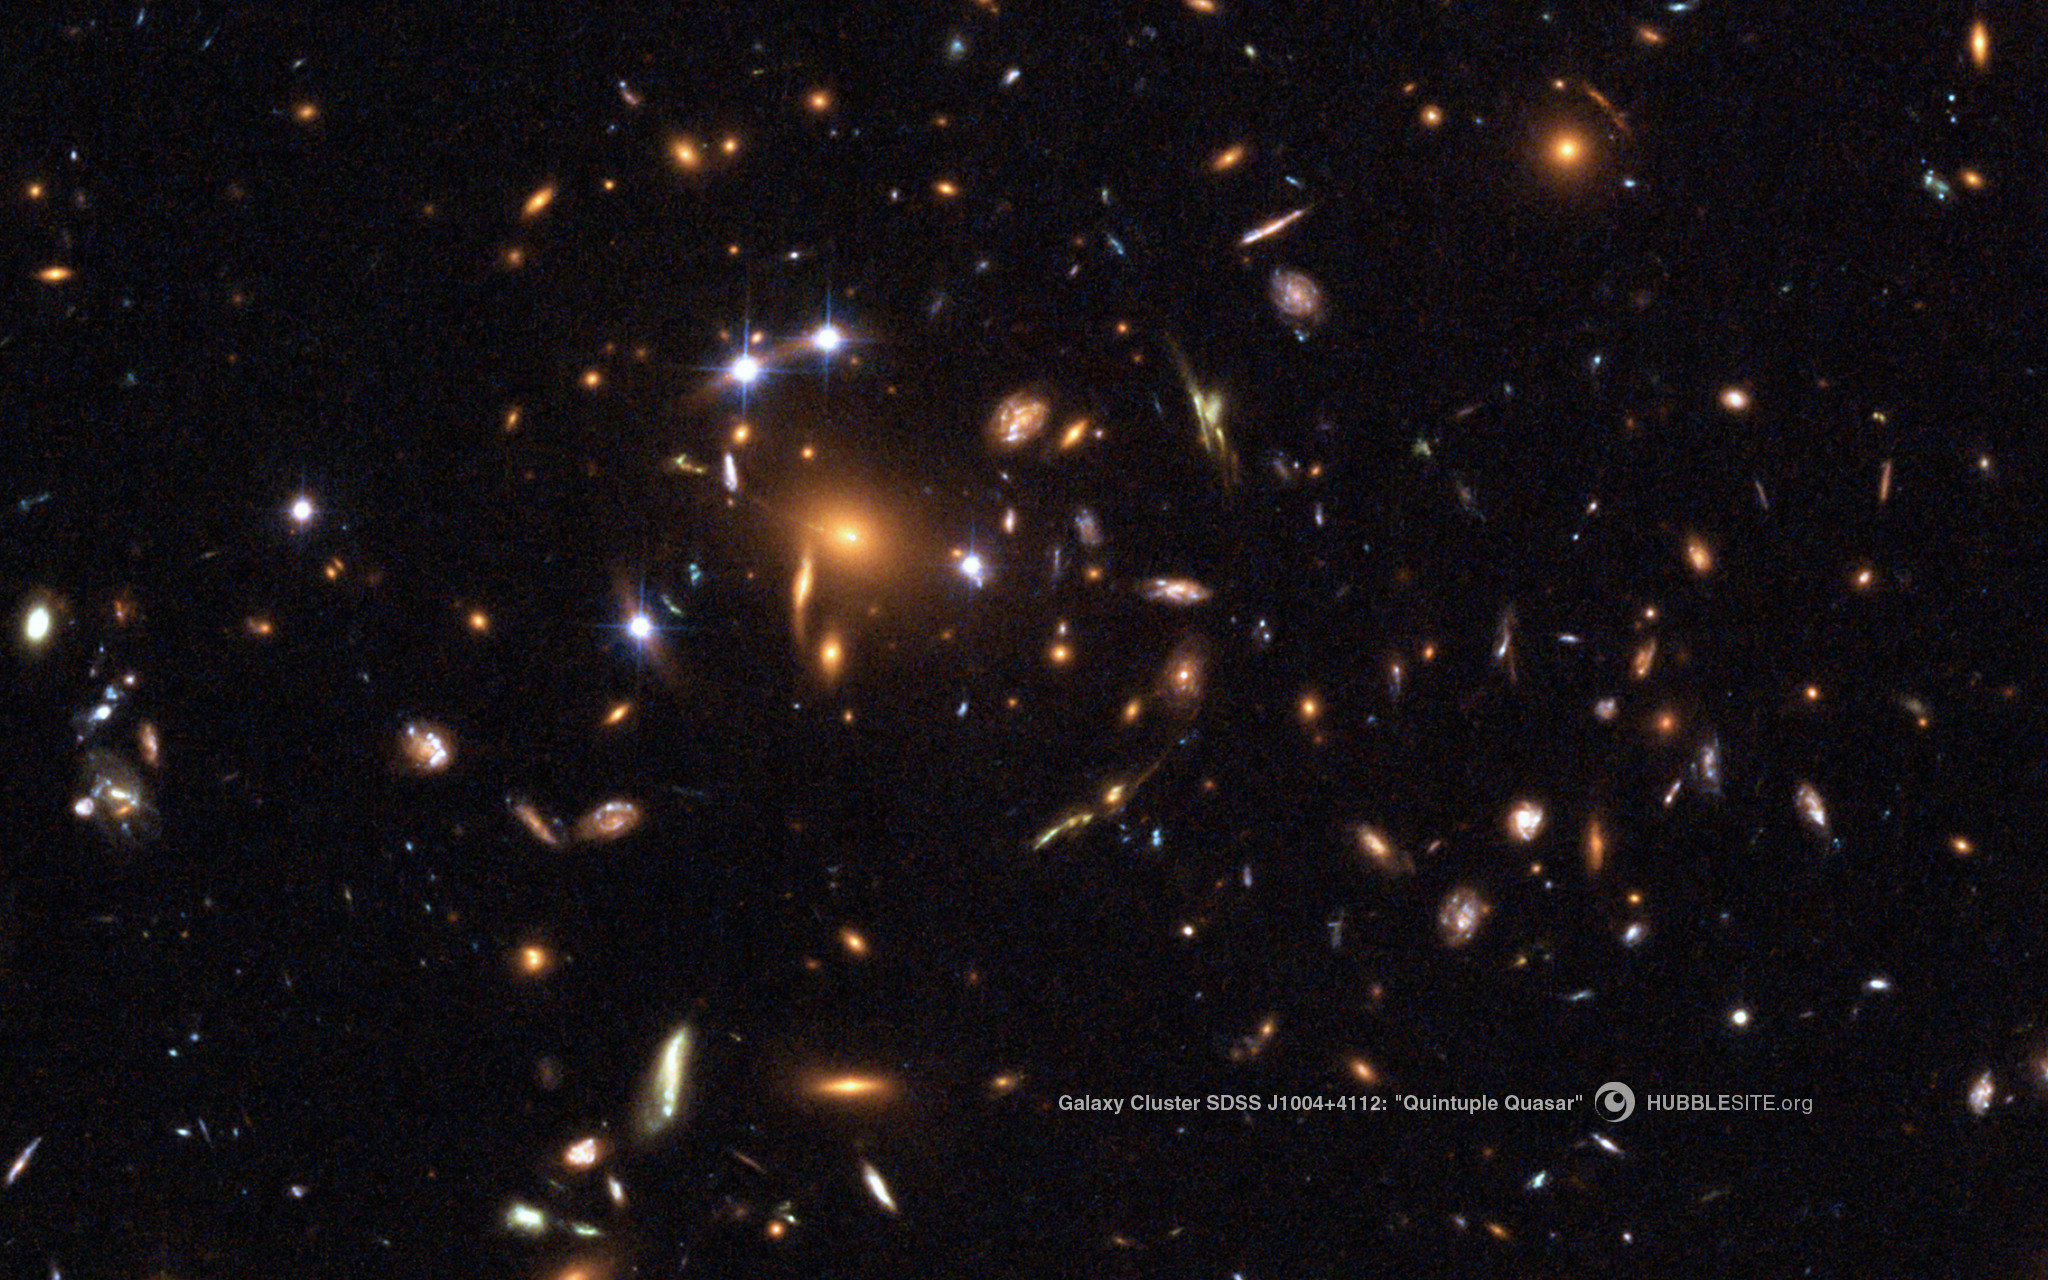 4 – A Gravitationally Lensed Quasar